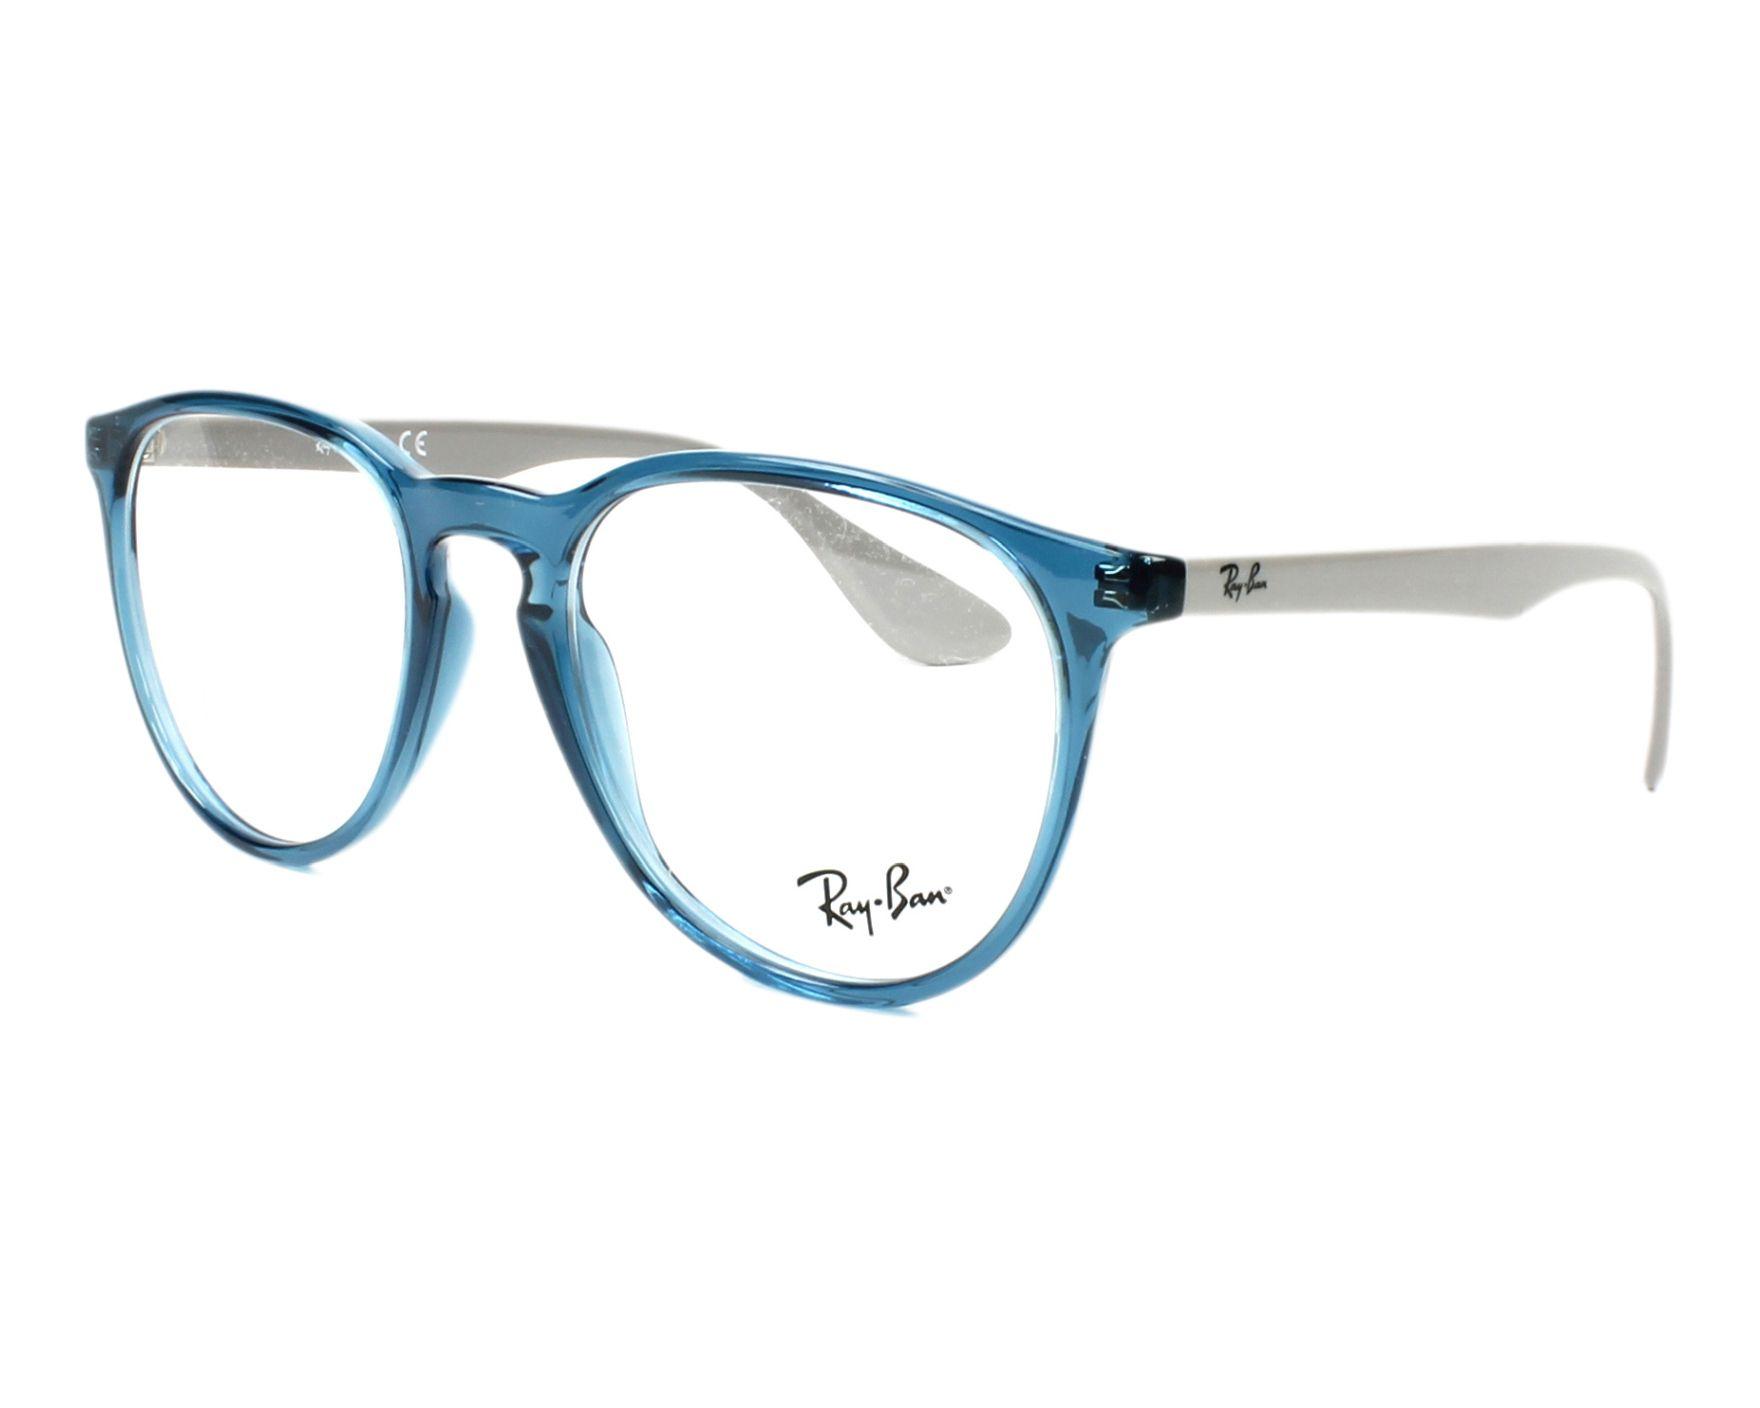 f10dac1ed8 Gafas Graduadas Ray-Ban RX-7046 5732 - Azul Gris vista de perfil